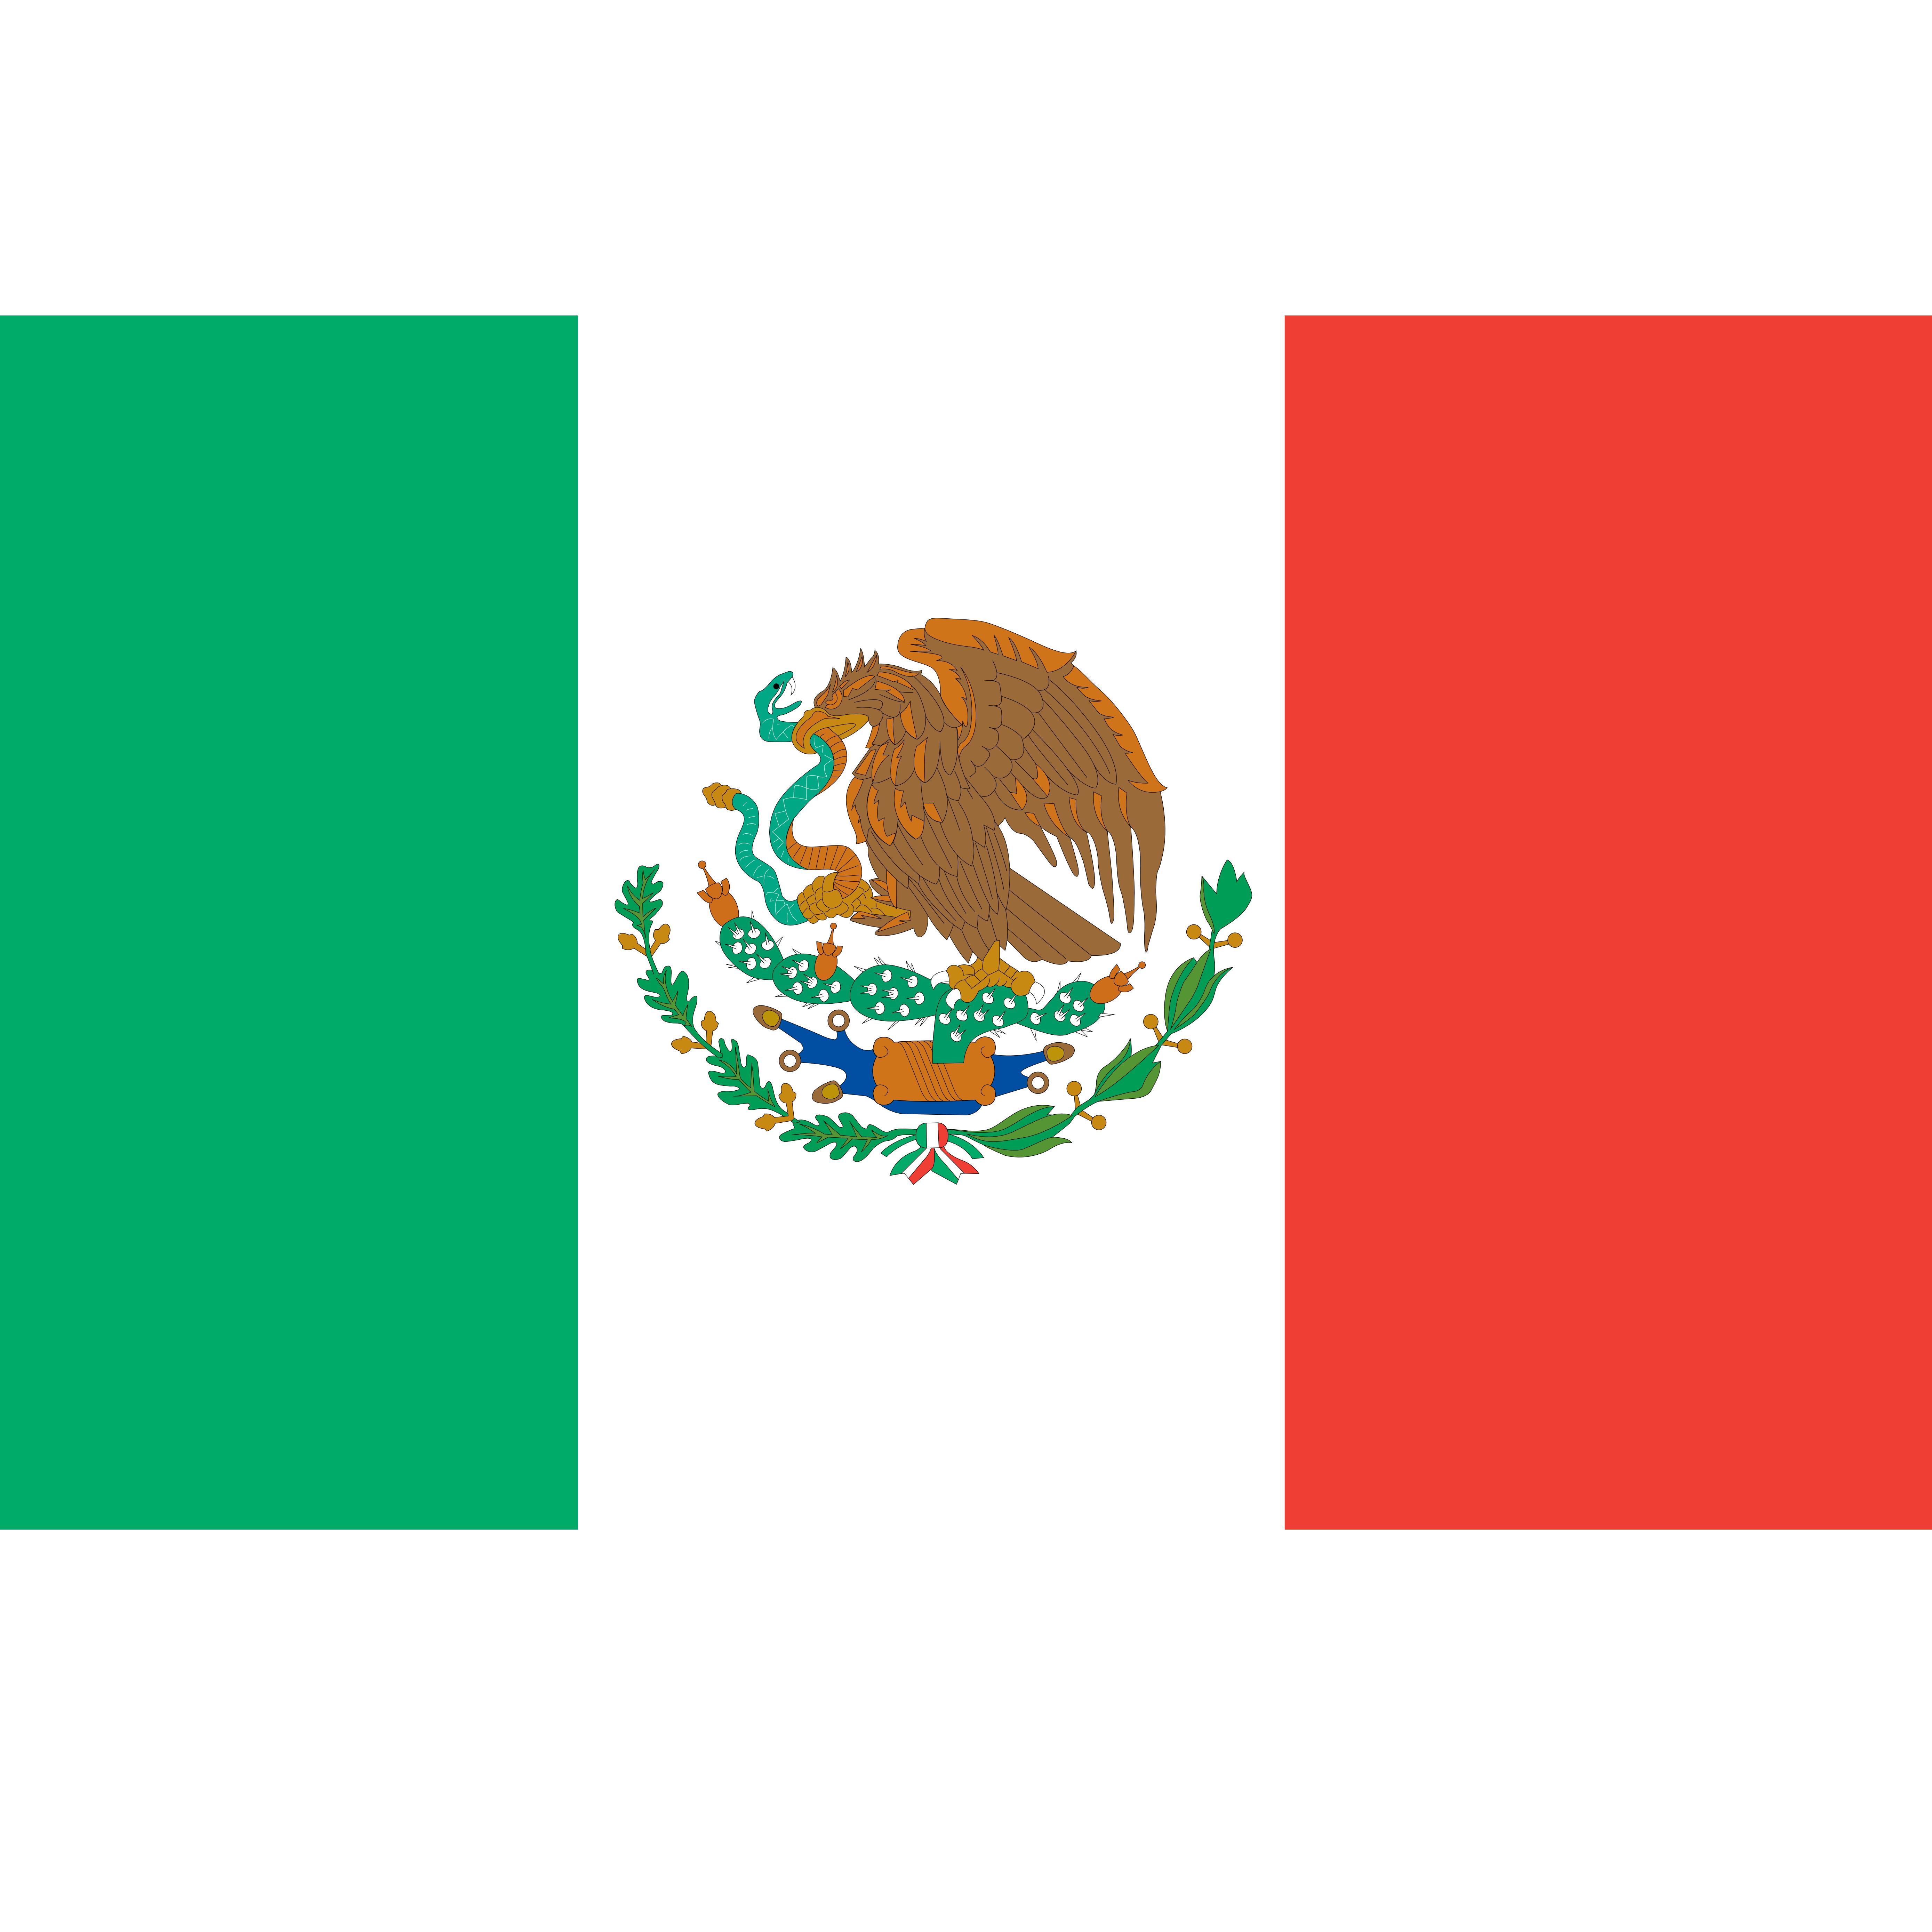 5555x5555 Mexican Flag Images Wallpaper Hd Pics For Laptop Clip Art Clipart